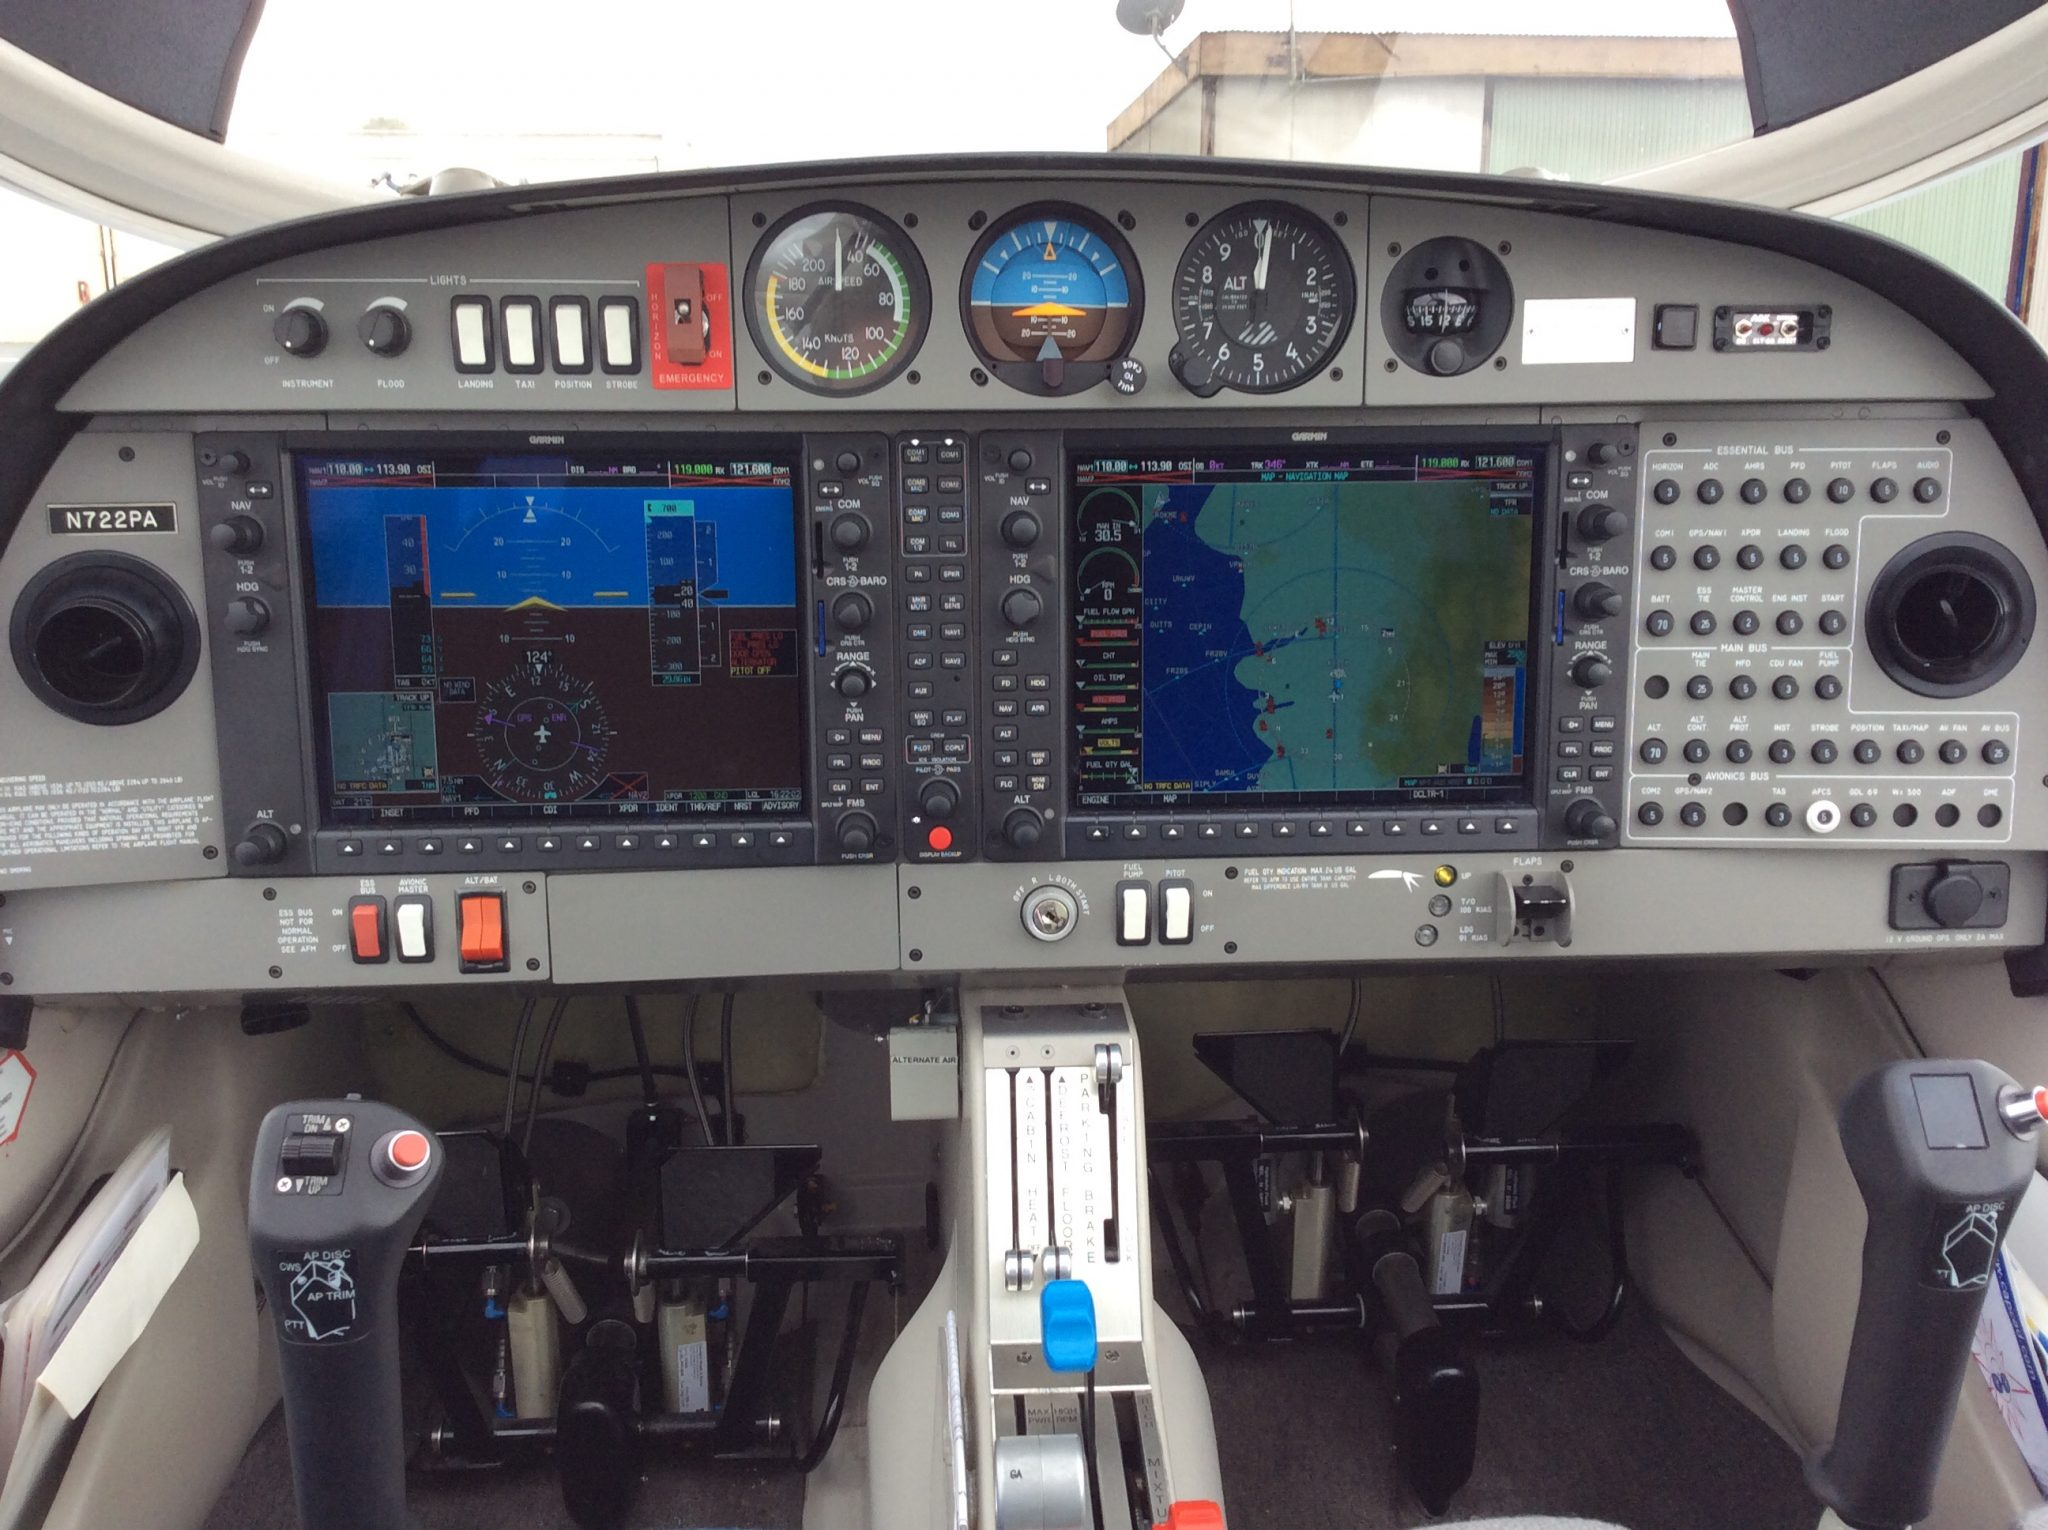 Inside Cockpit of Diamond Star DA40